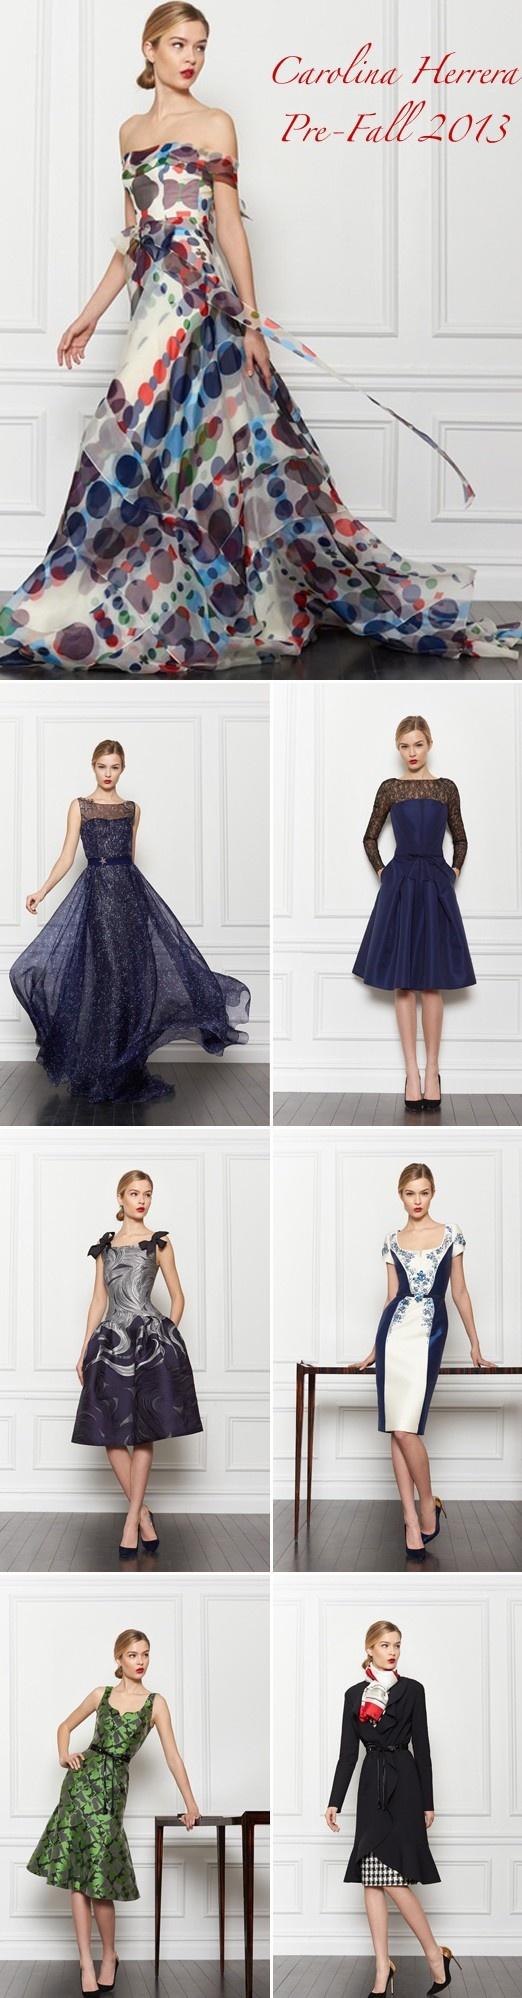 Carolina Herrera's Pre-Fall 2013 Collection ♥✤ | Keep the Glamour | BeStayBeautiful